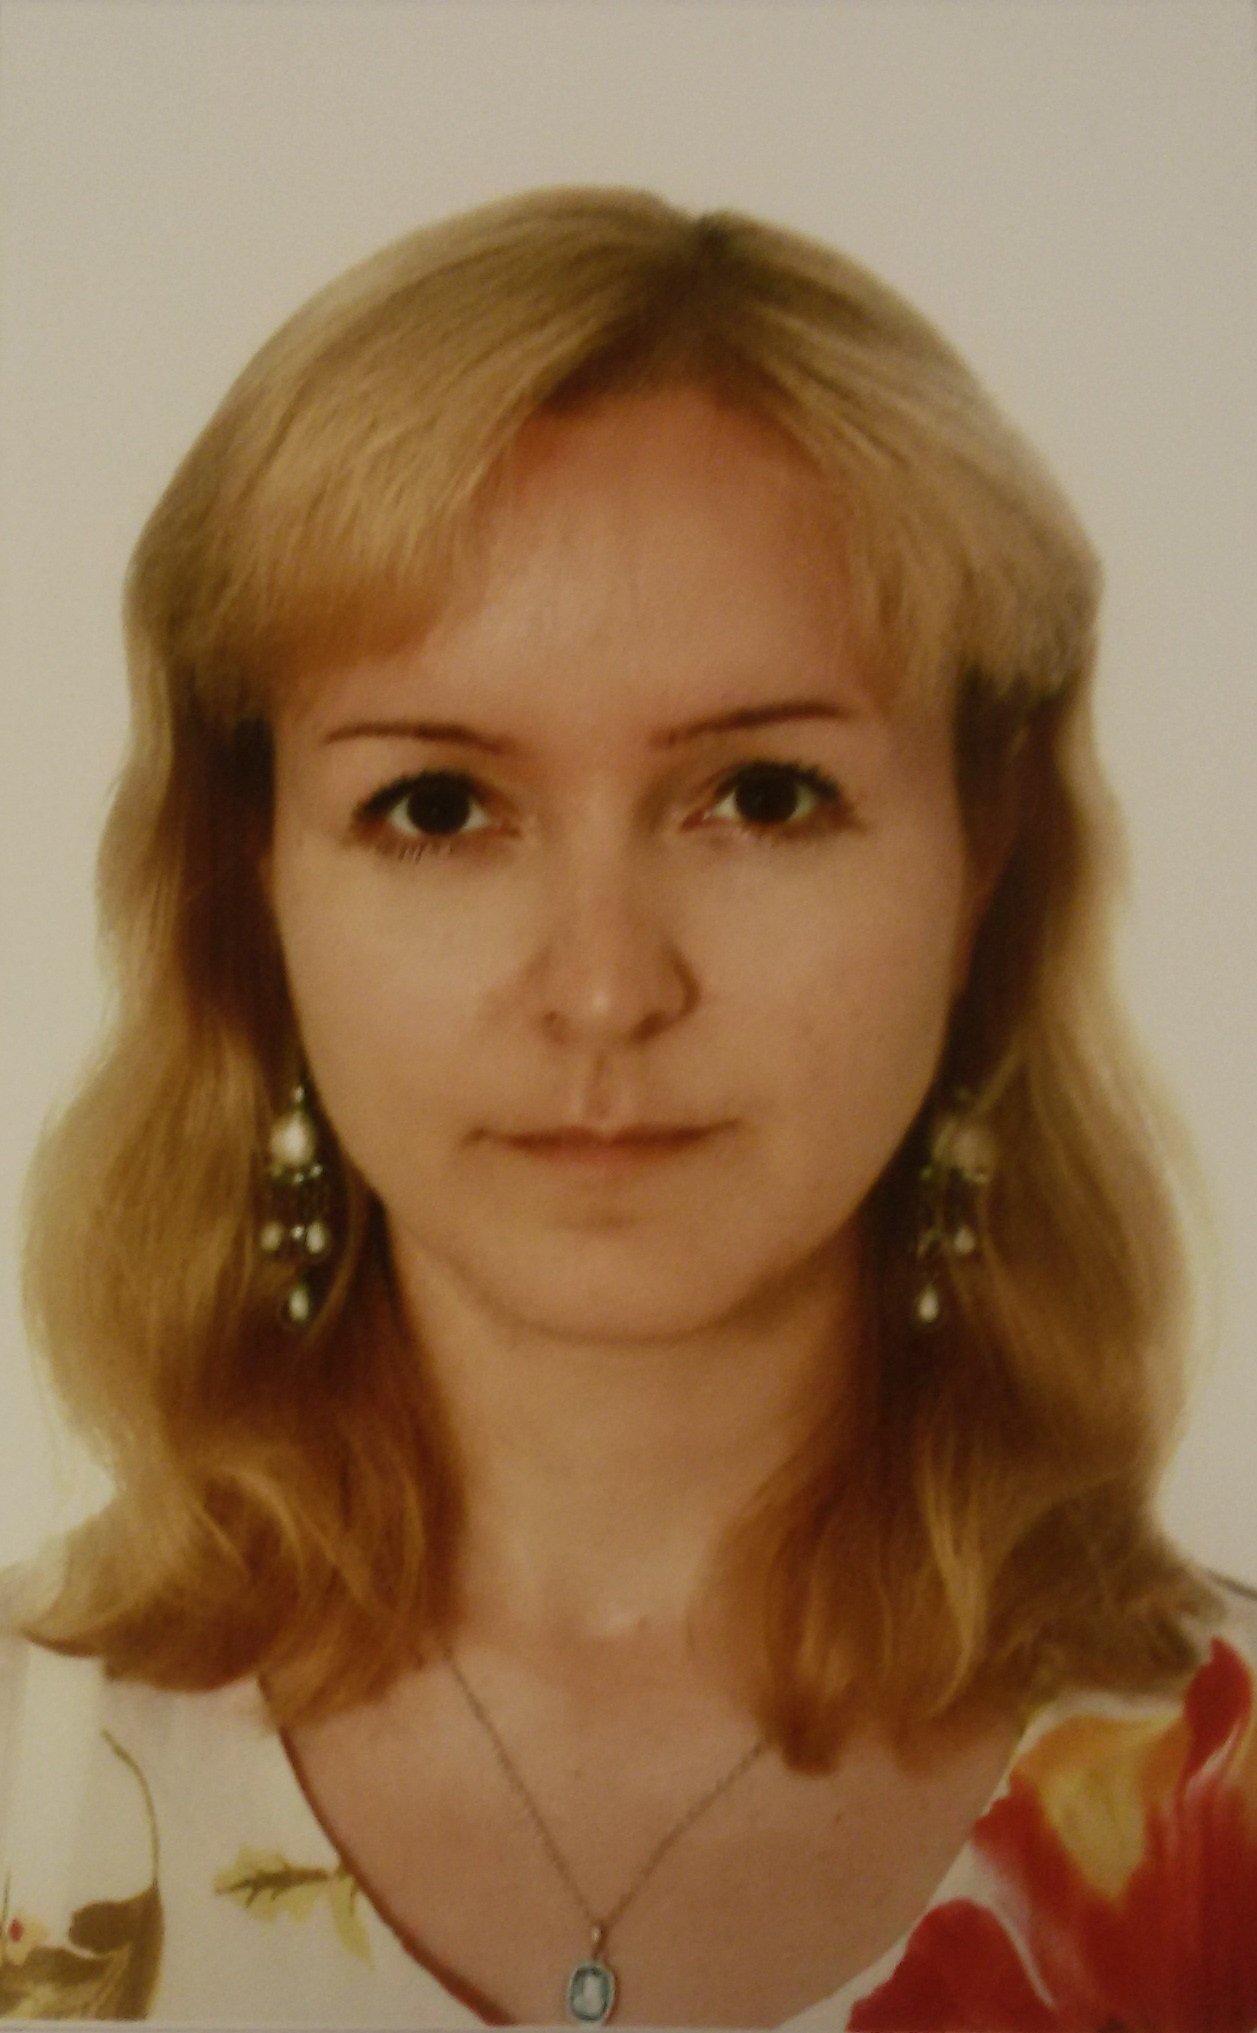 Юшкова Елена